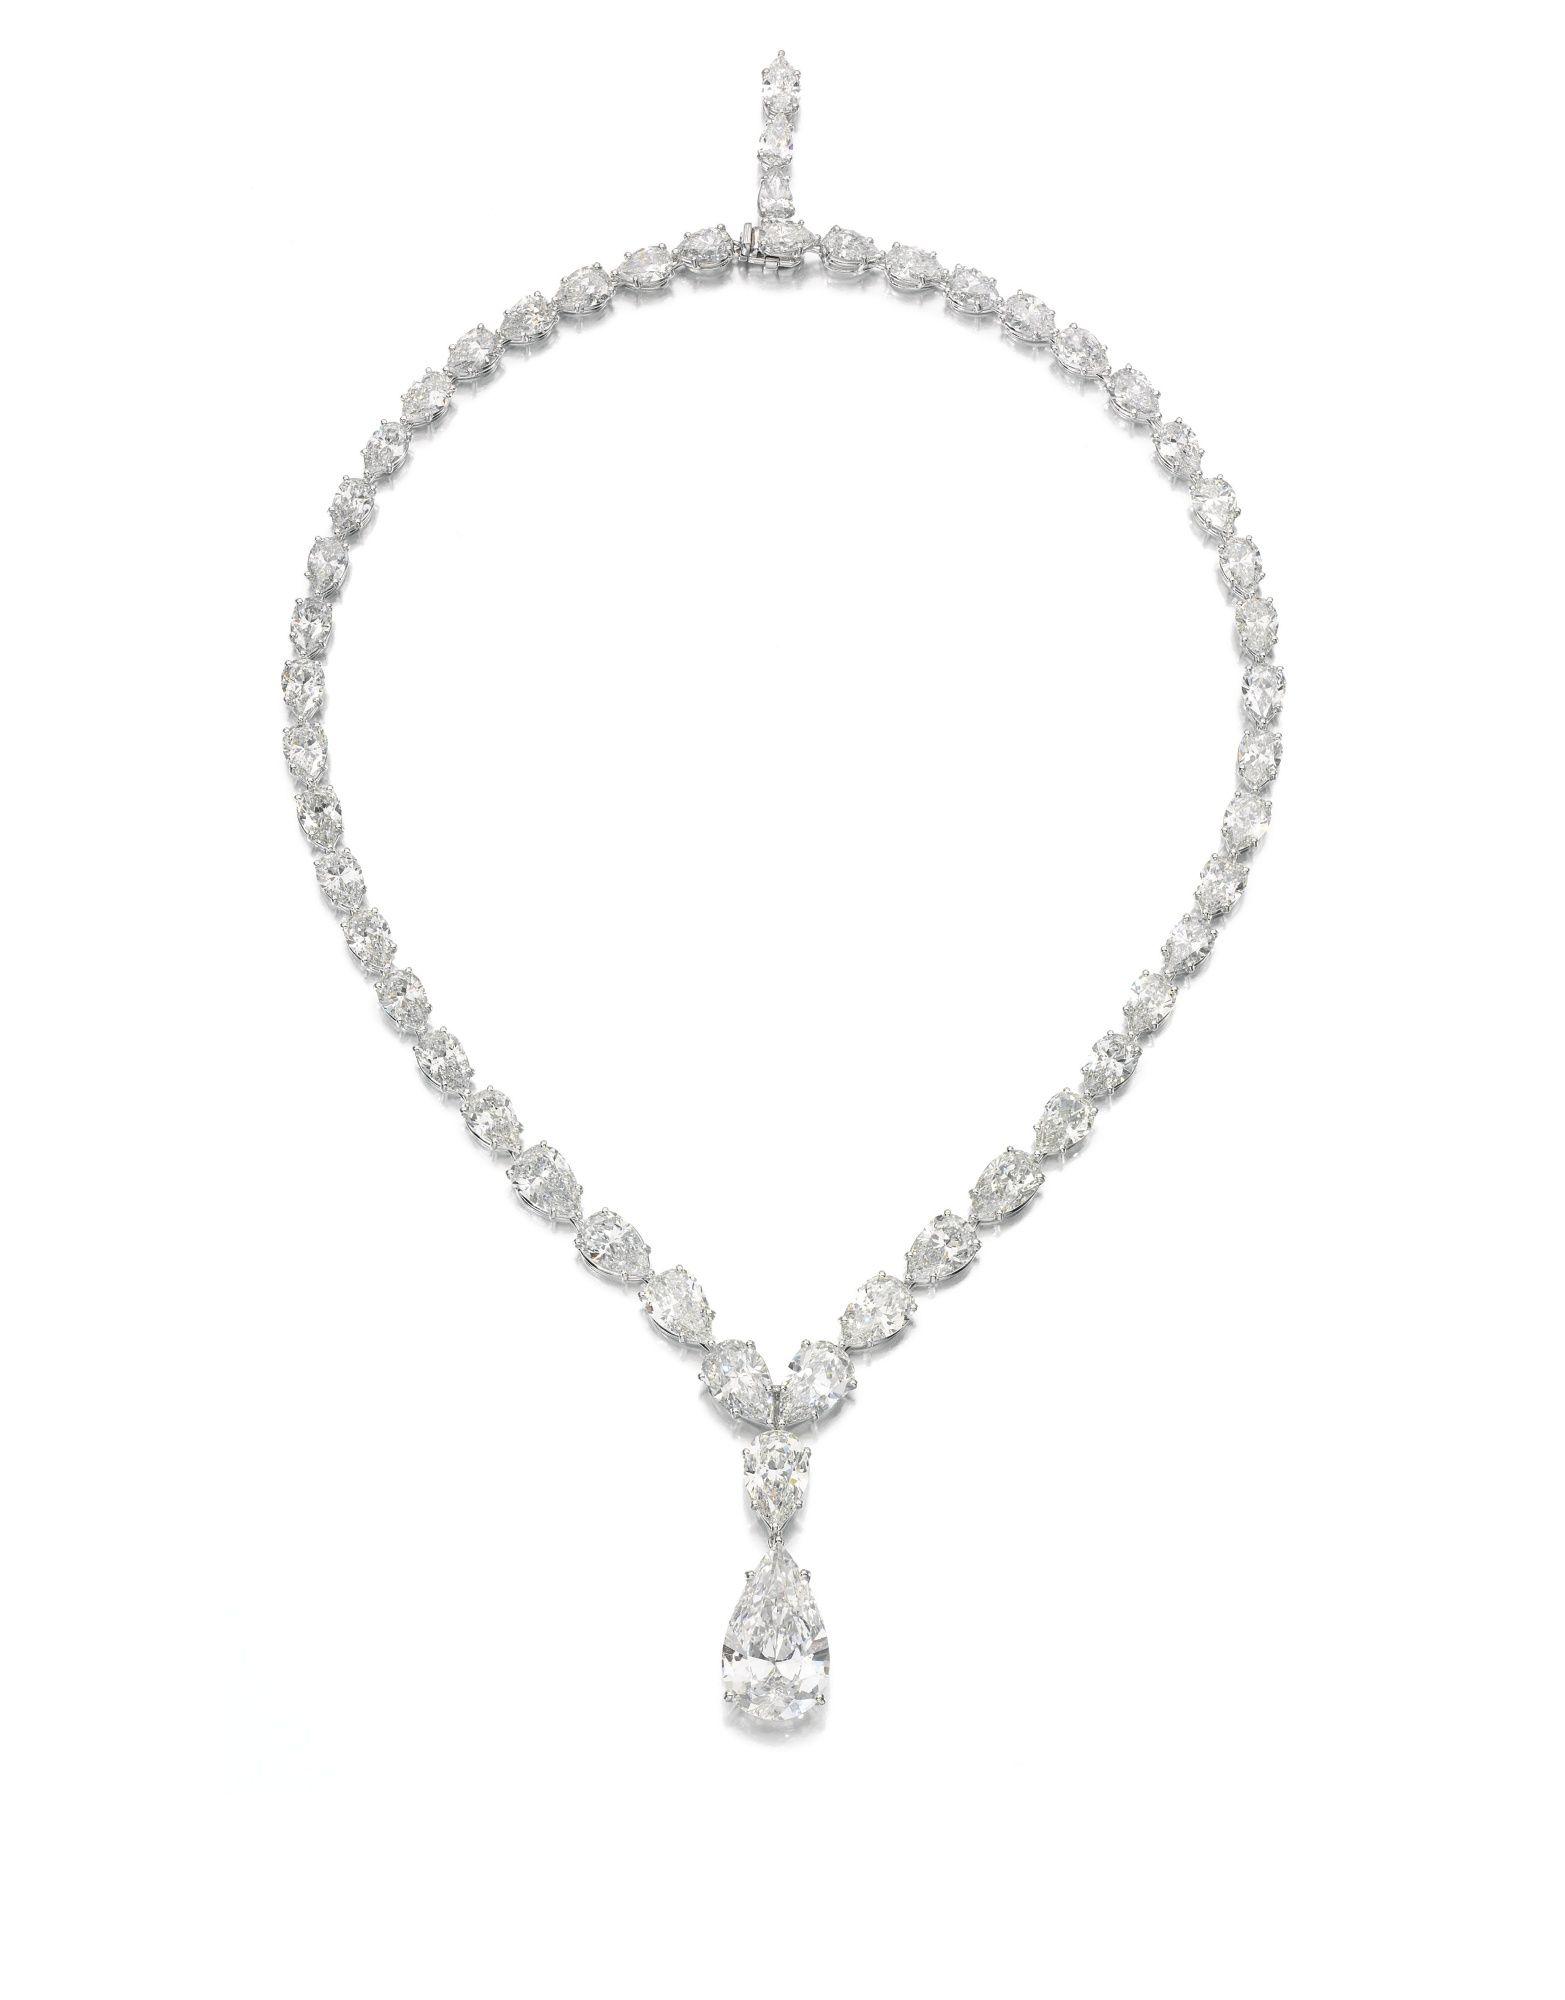 Important And Fine Diamond Necklace Graff Lot Sotheby S Real Diamond Necklace Diamond Necklace Graff Diamonds